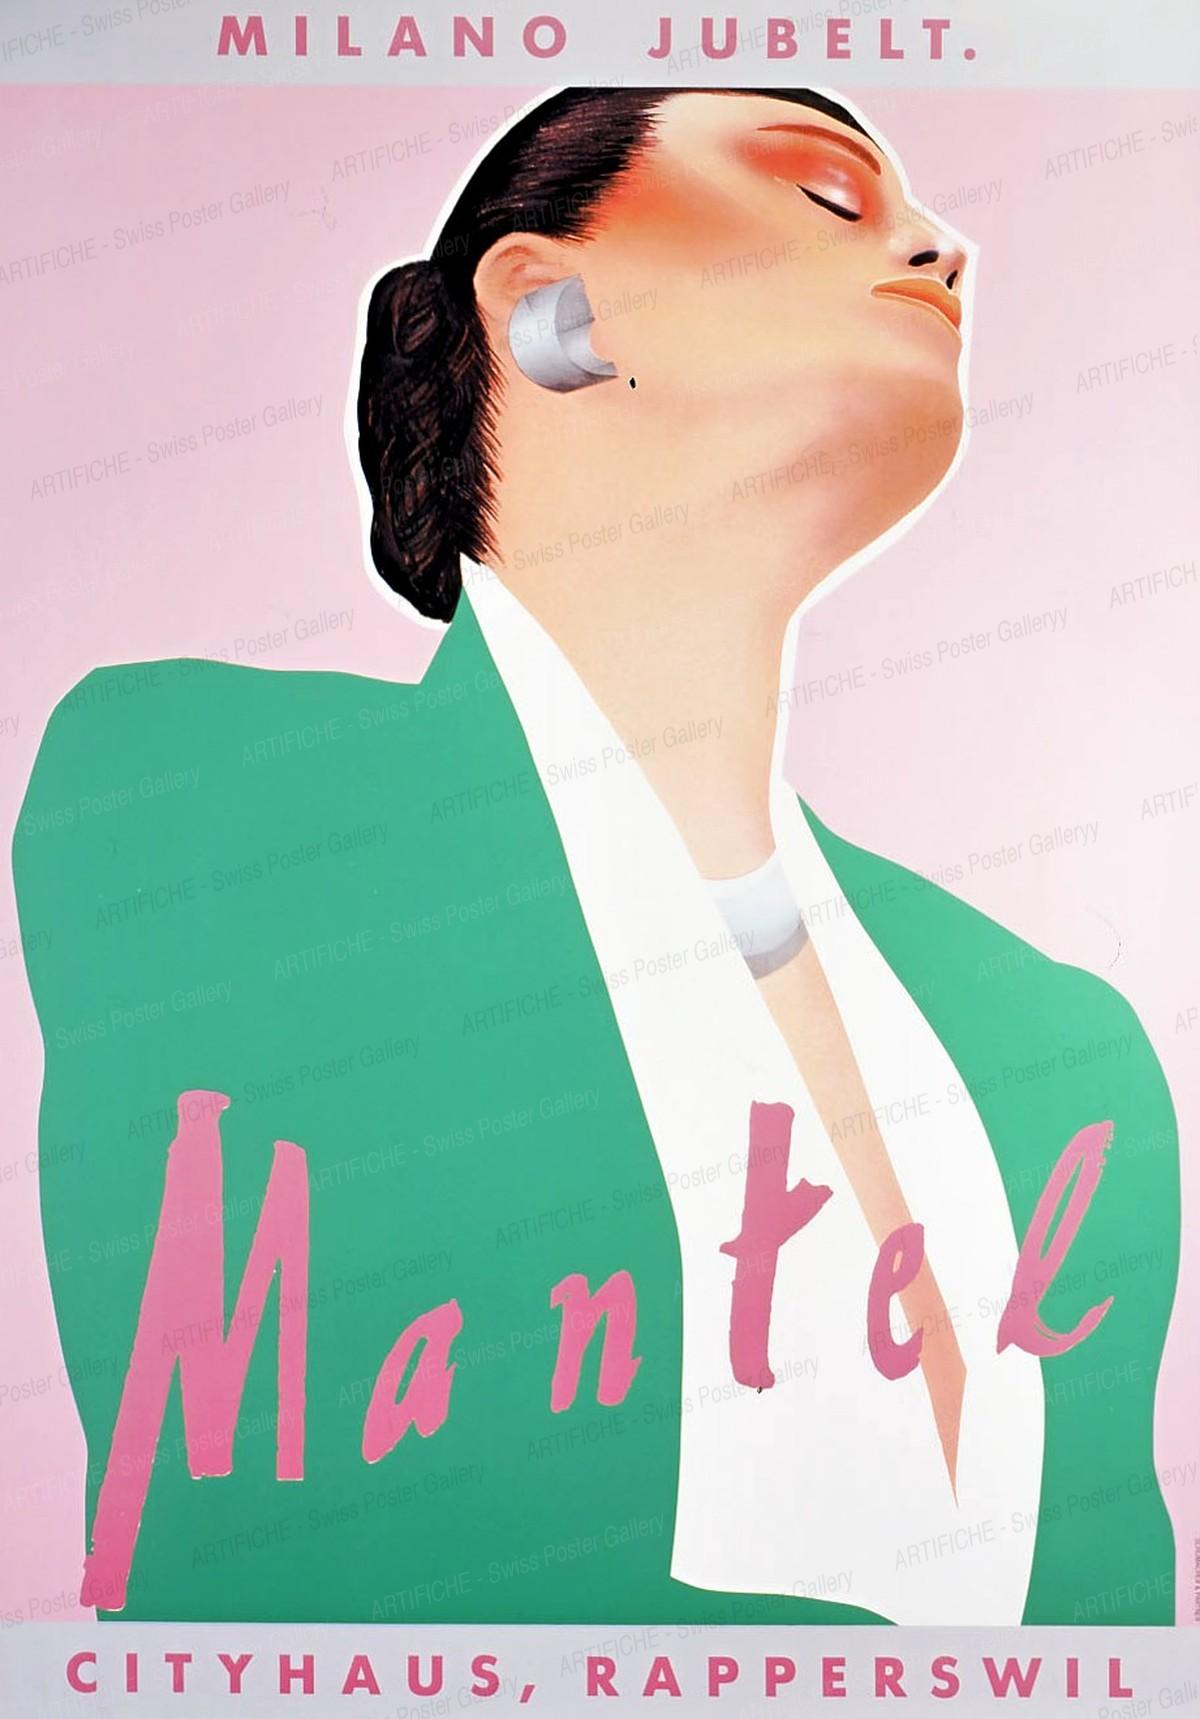 MILANO JUBELT. Mantel – CITYHAUS RAPPERSWIL, Rémy Fabrikant